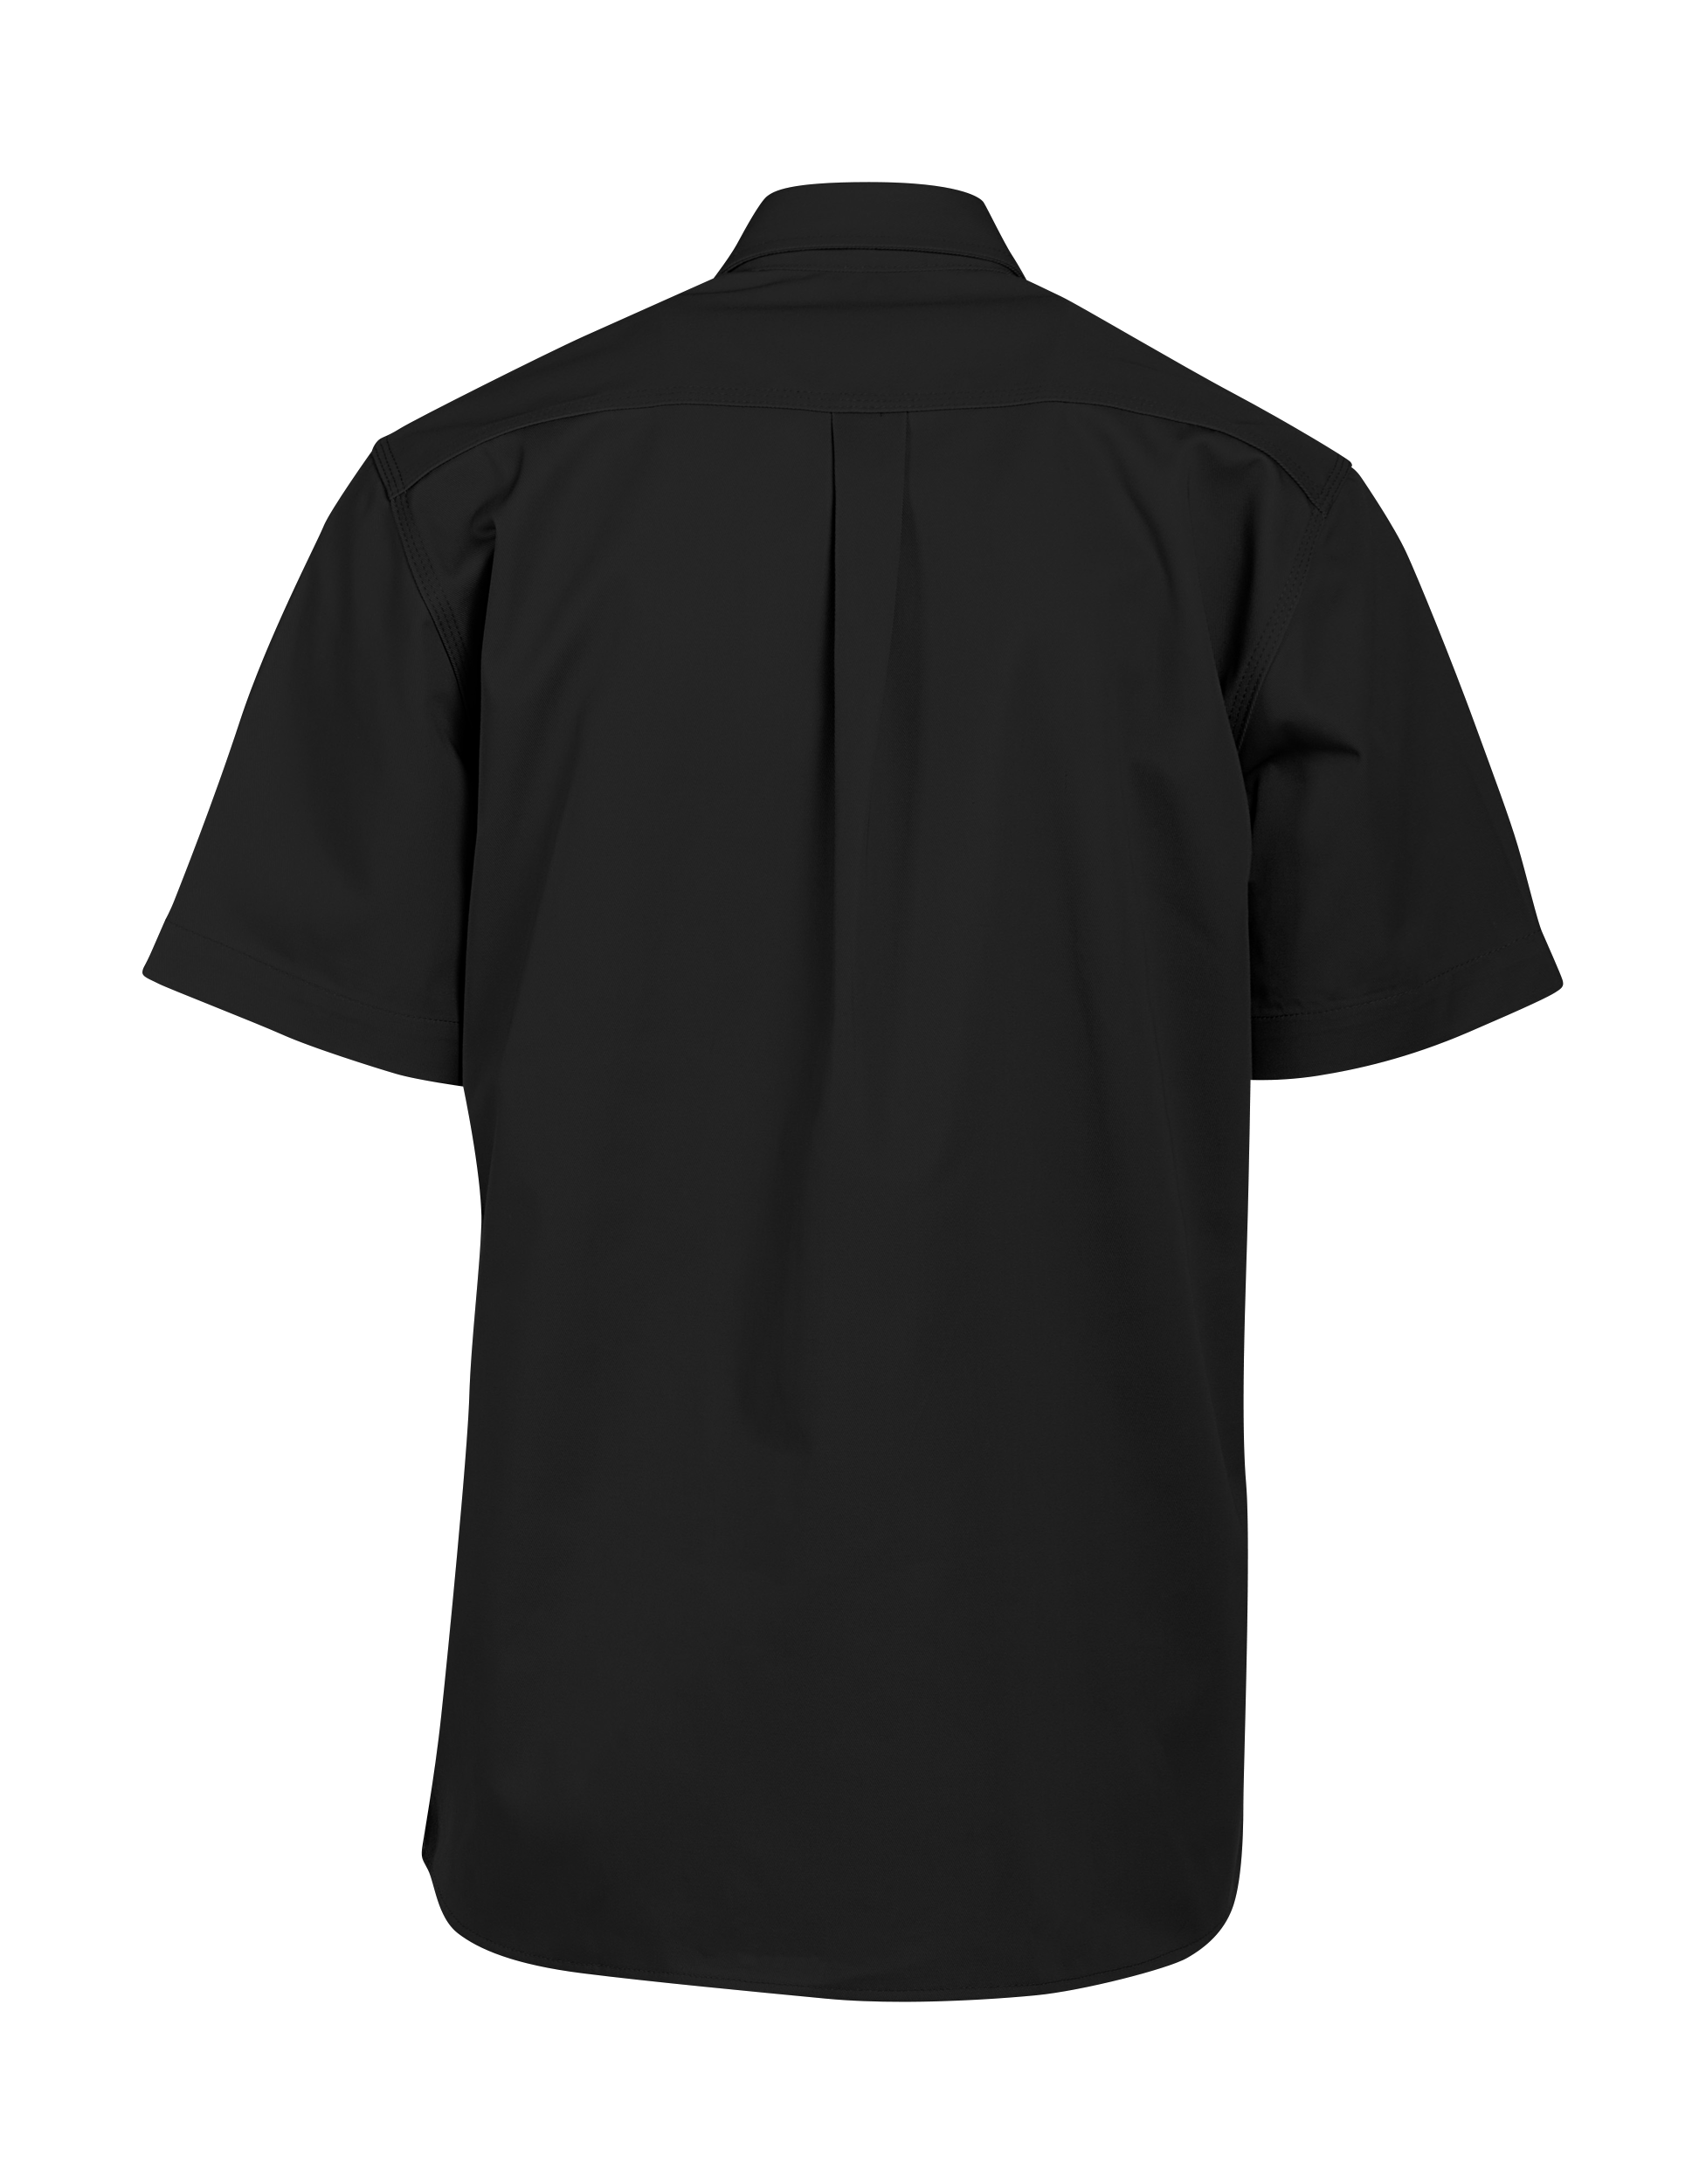 Samson - Workwear - Mens Short Sleeve Workwear Shirt